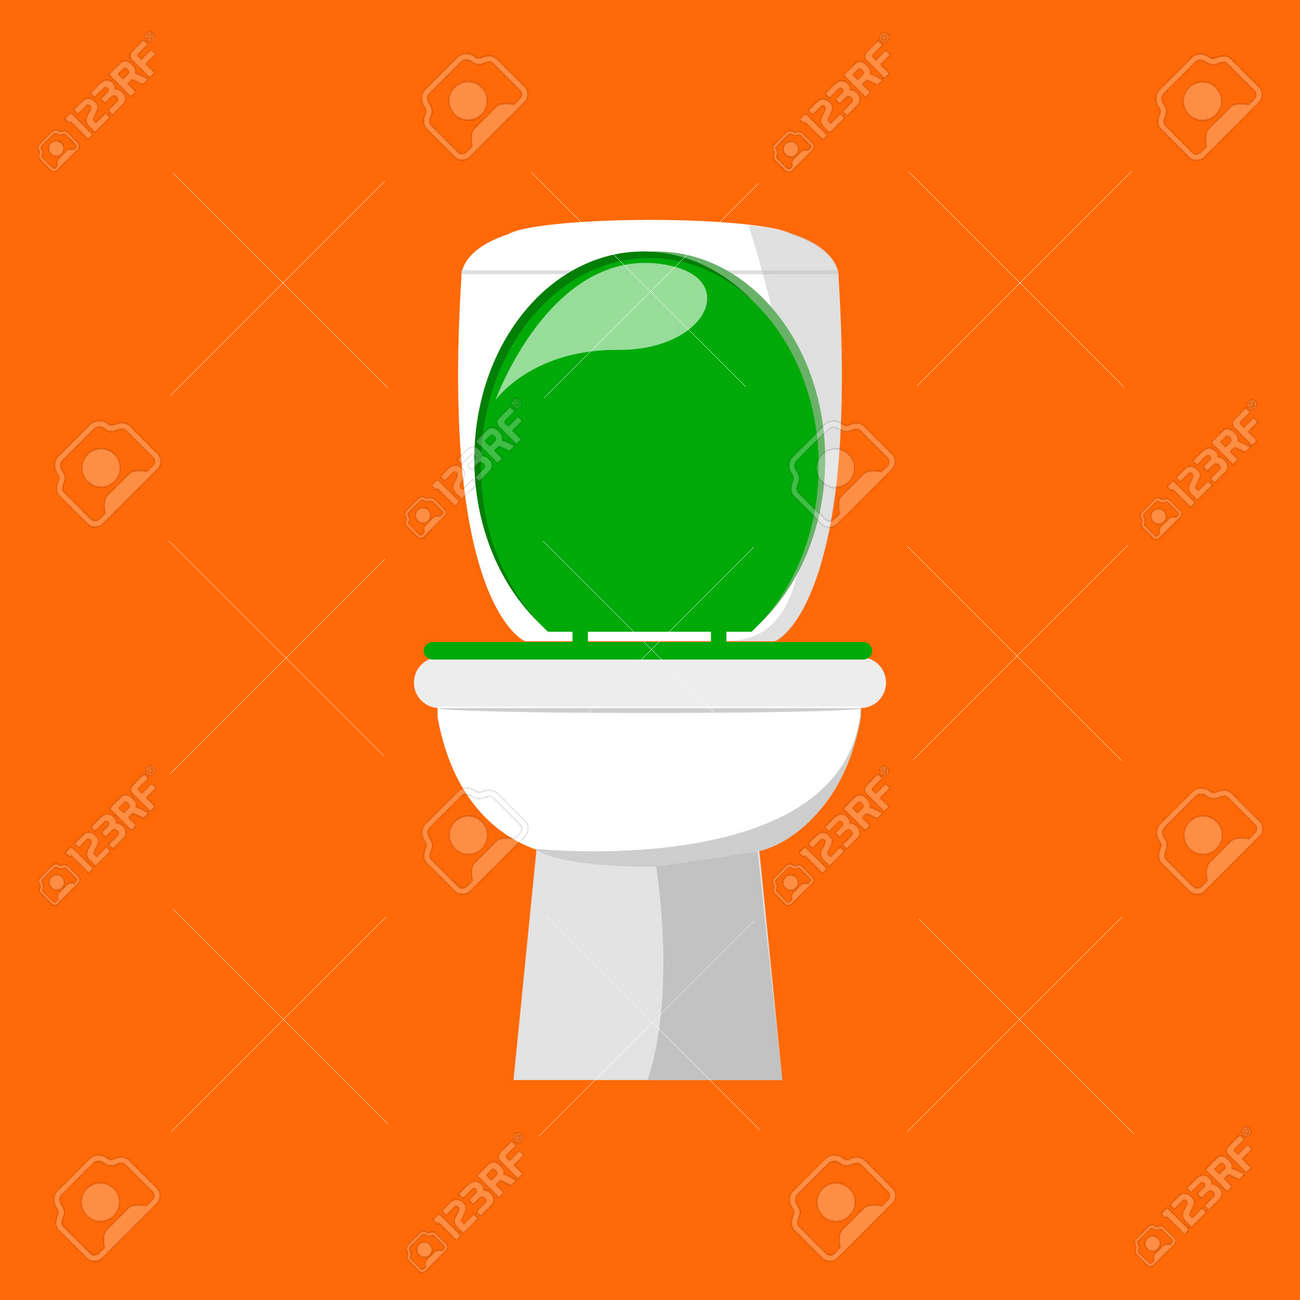 White ceramic toilet in flat style isolated on orange background. Vector illustration EPS 10. - 146957667